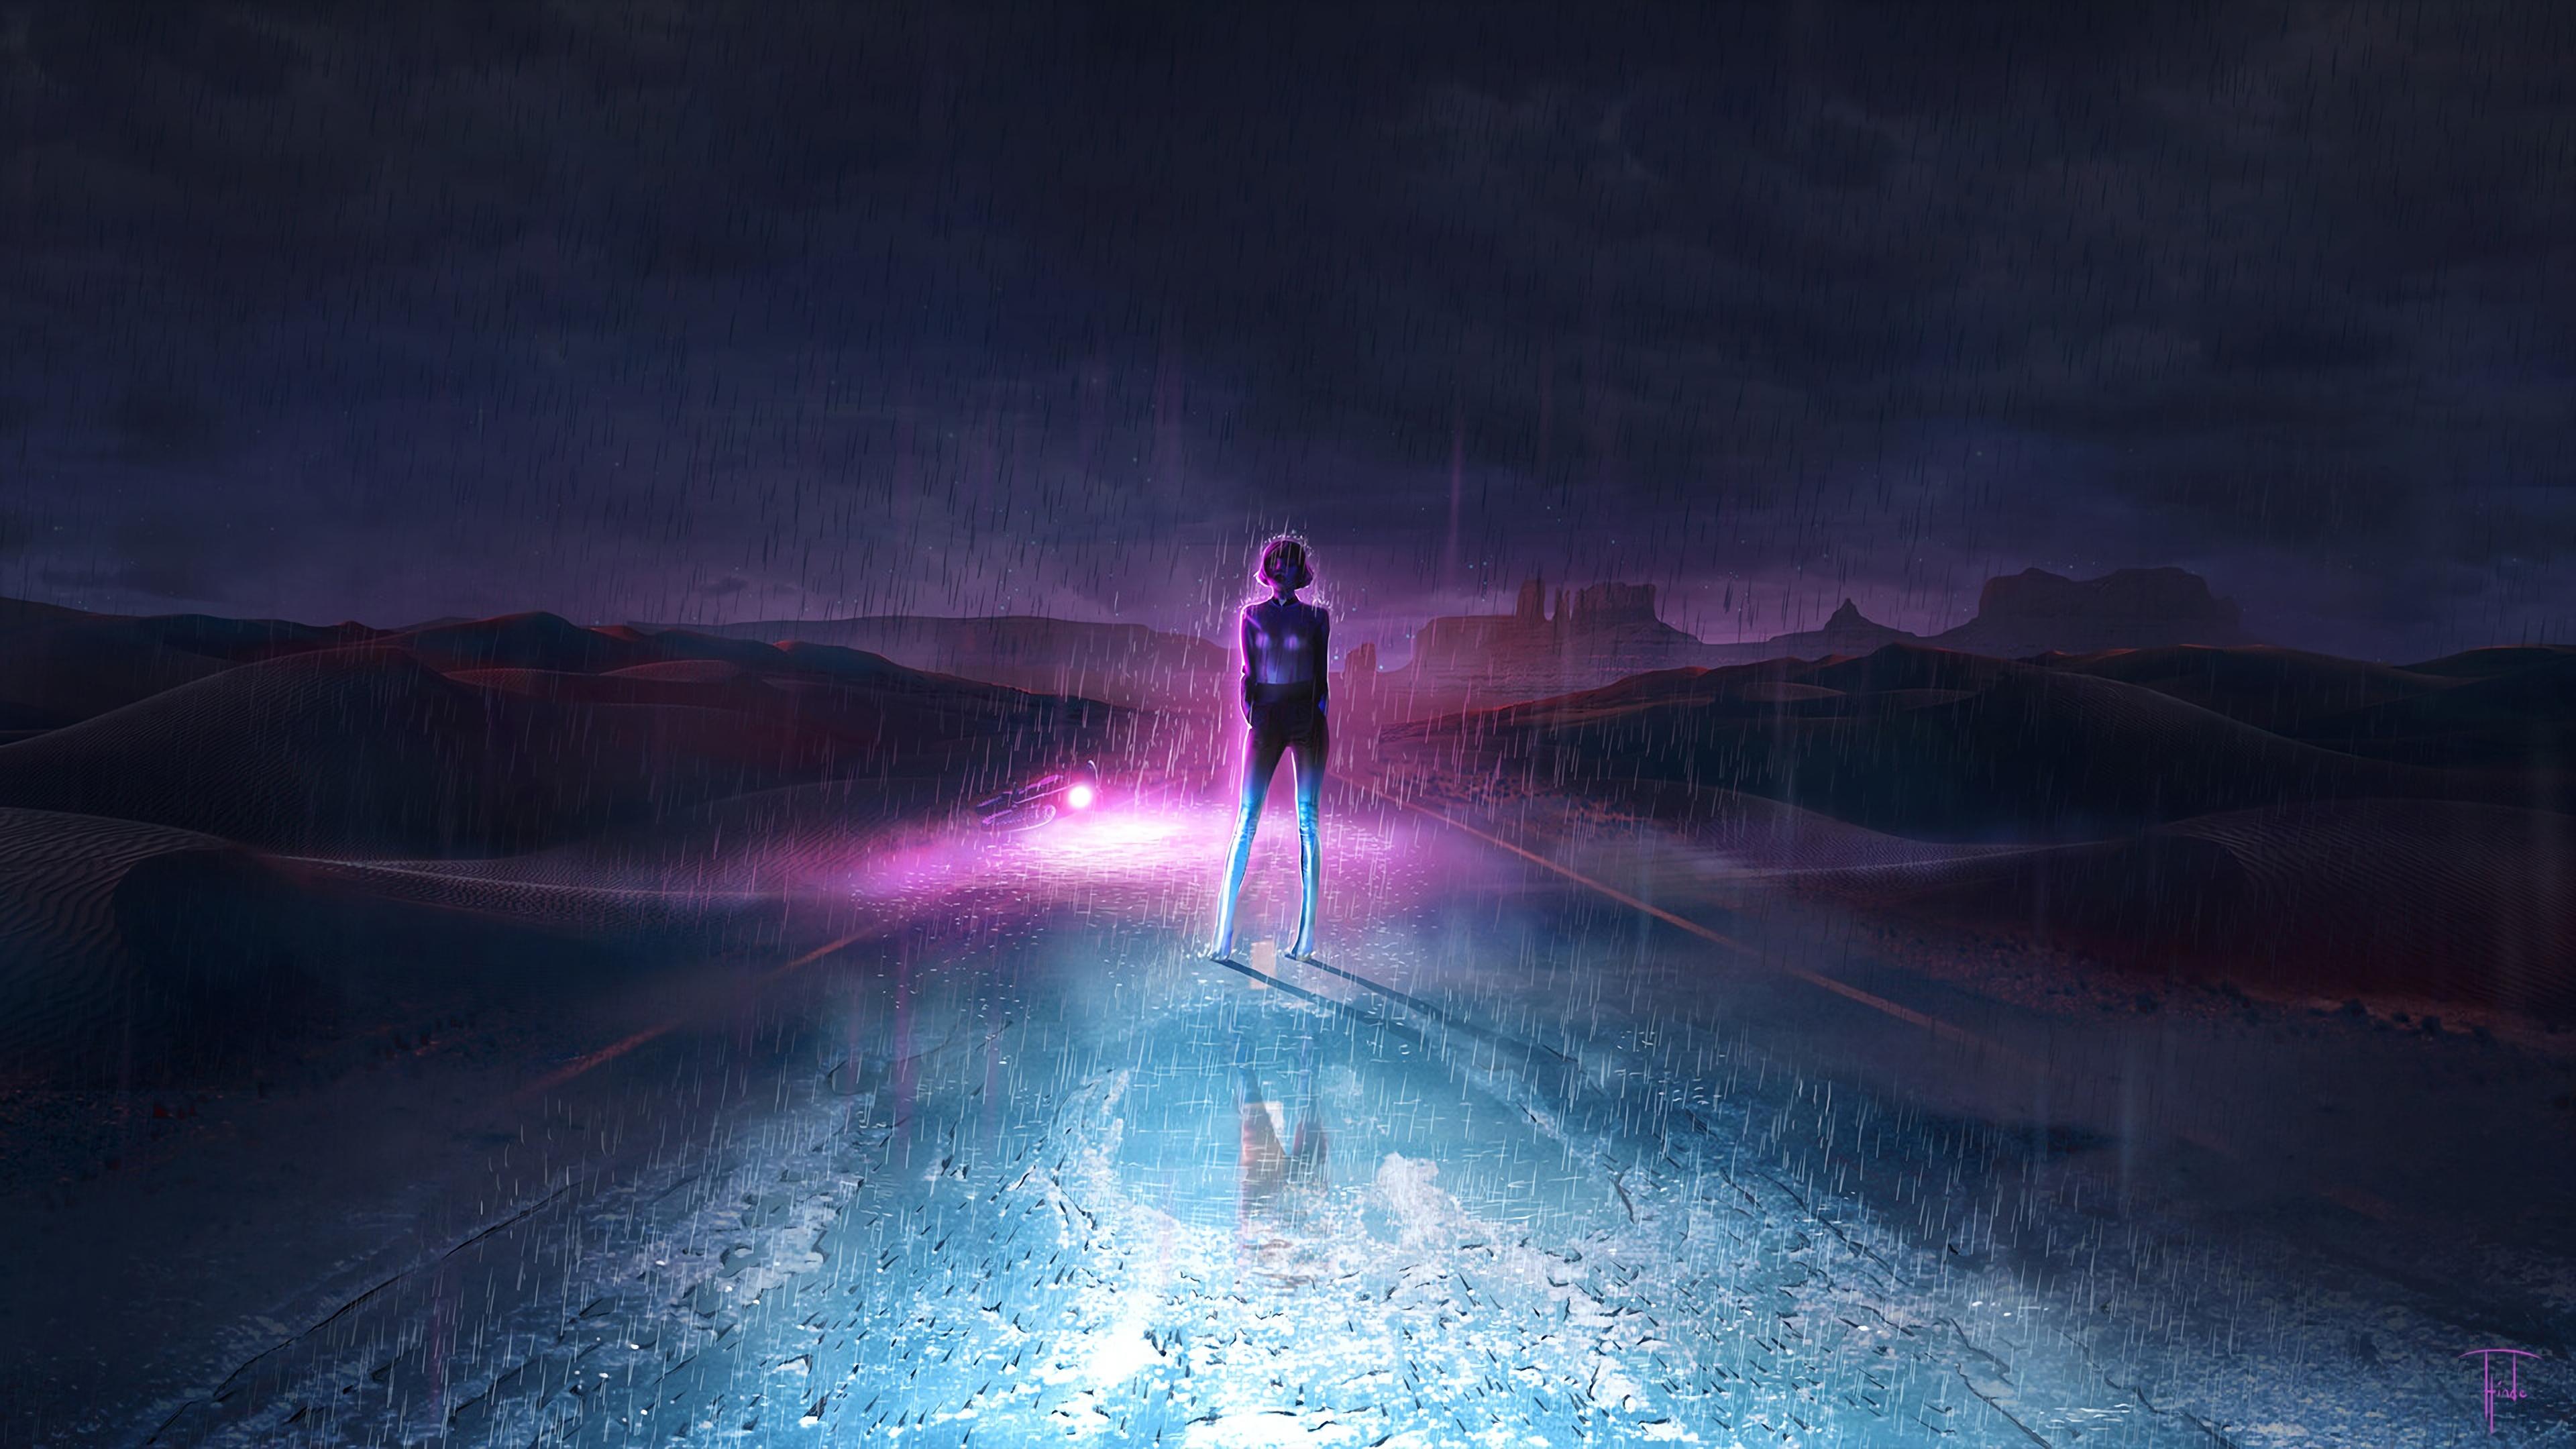 Neon Dark Sky Road 4k Hd Artist 4k Wallpapers Images